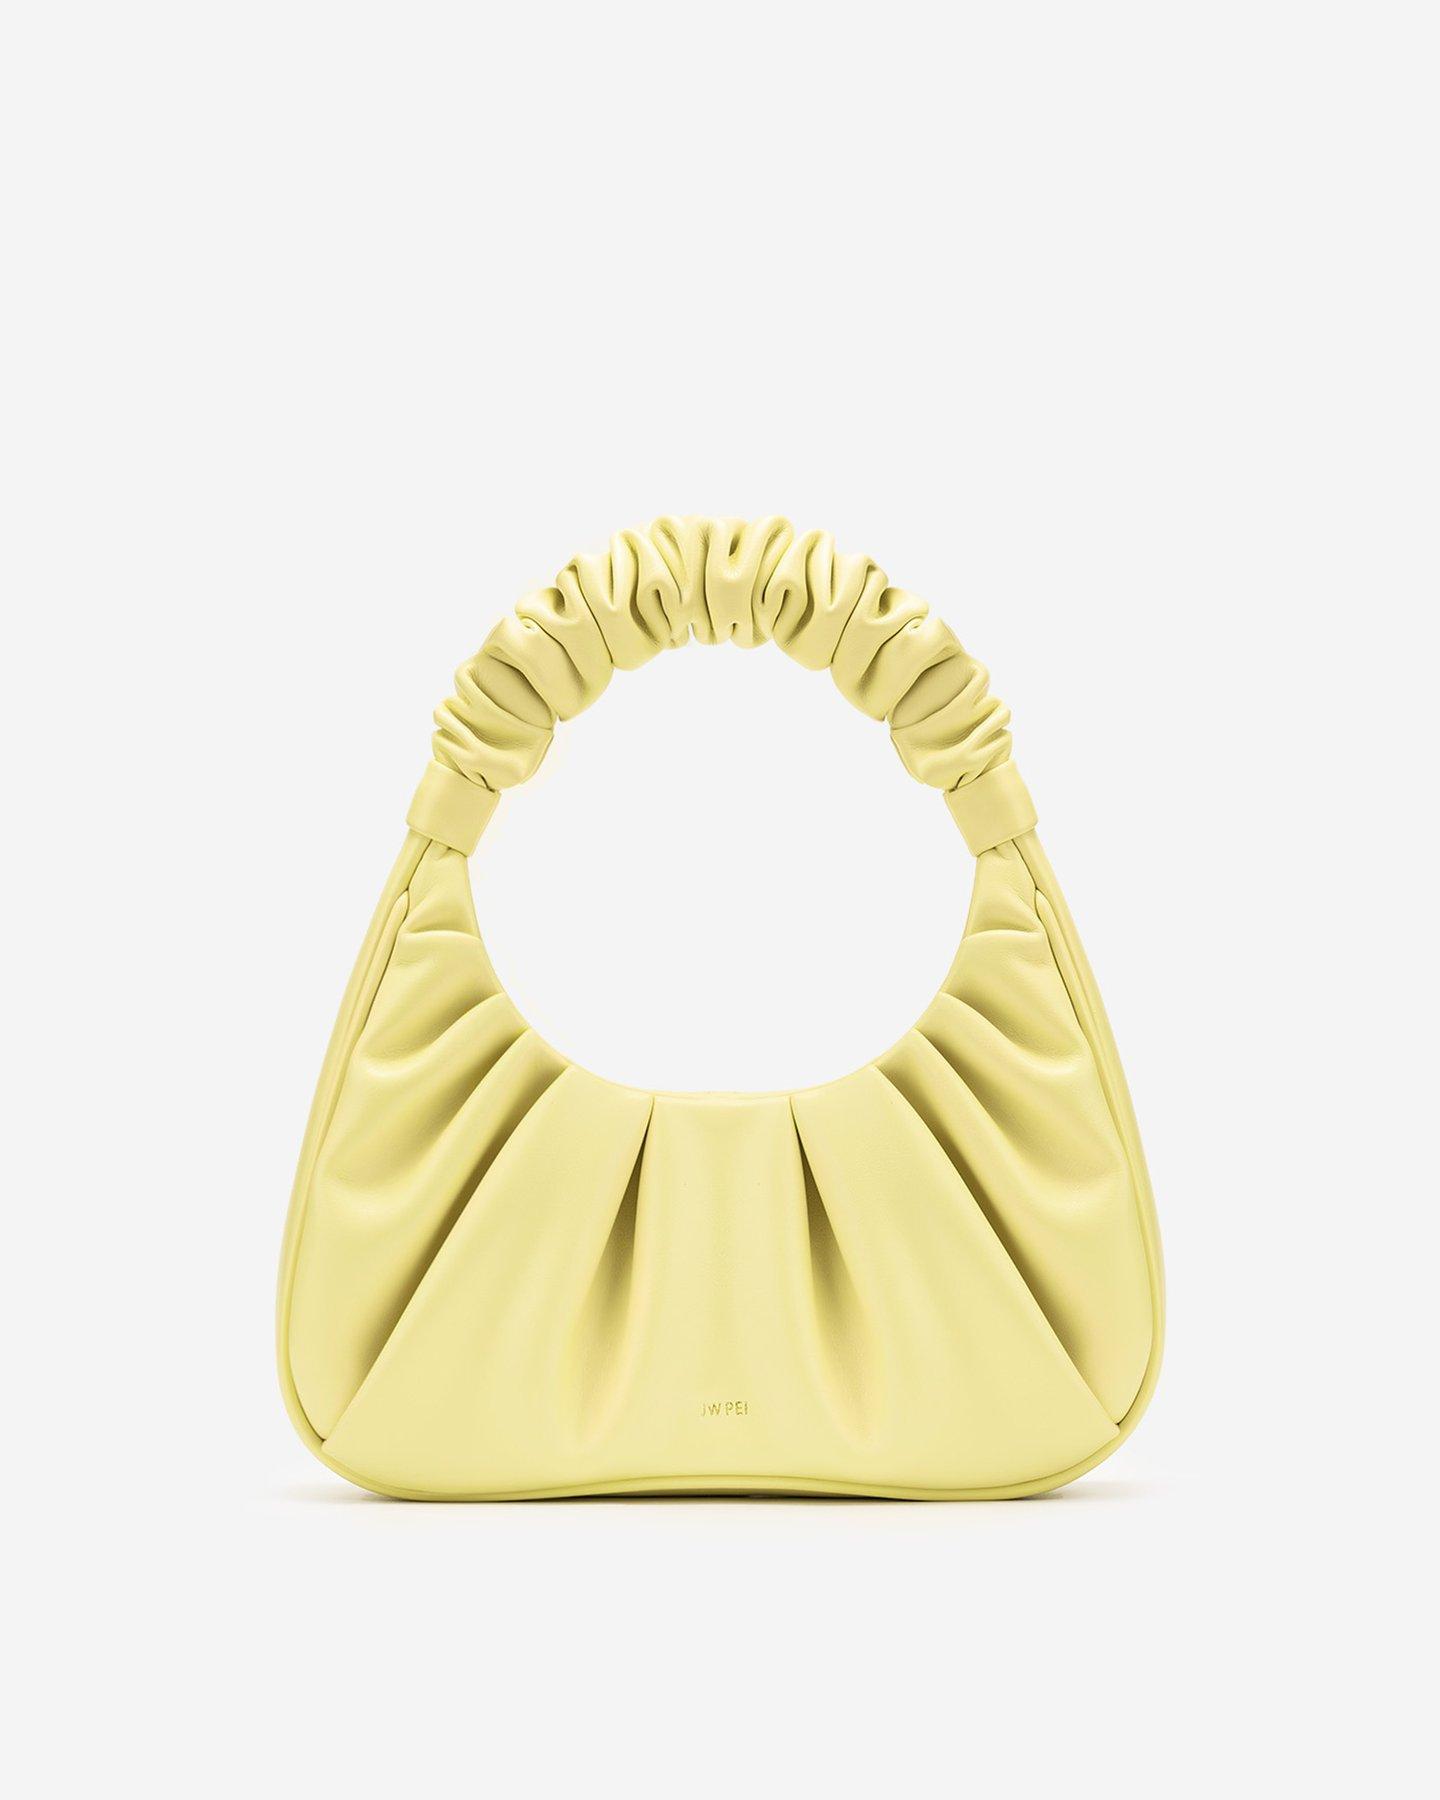 Gabbi Bag - Light Yellow by Jw Pei, available on jwpei.com for $58 Emily Ratajkowski Bags Exact Product